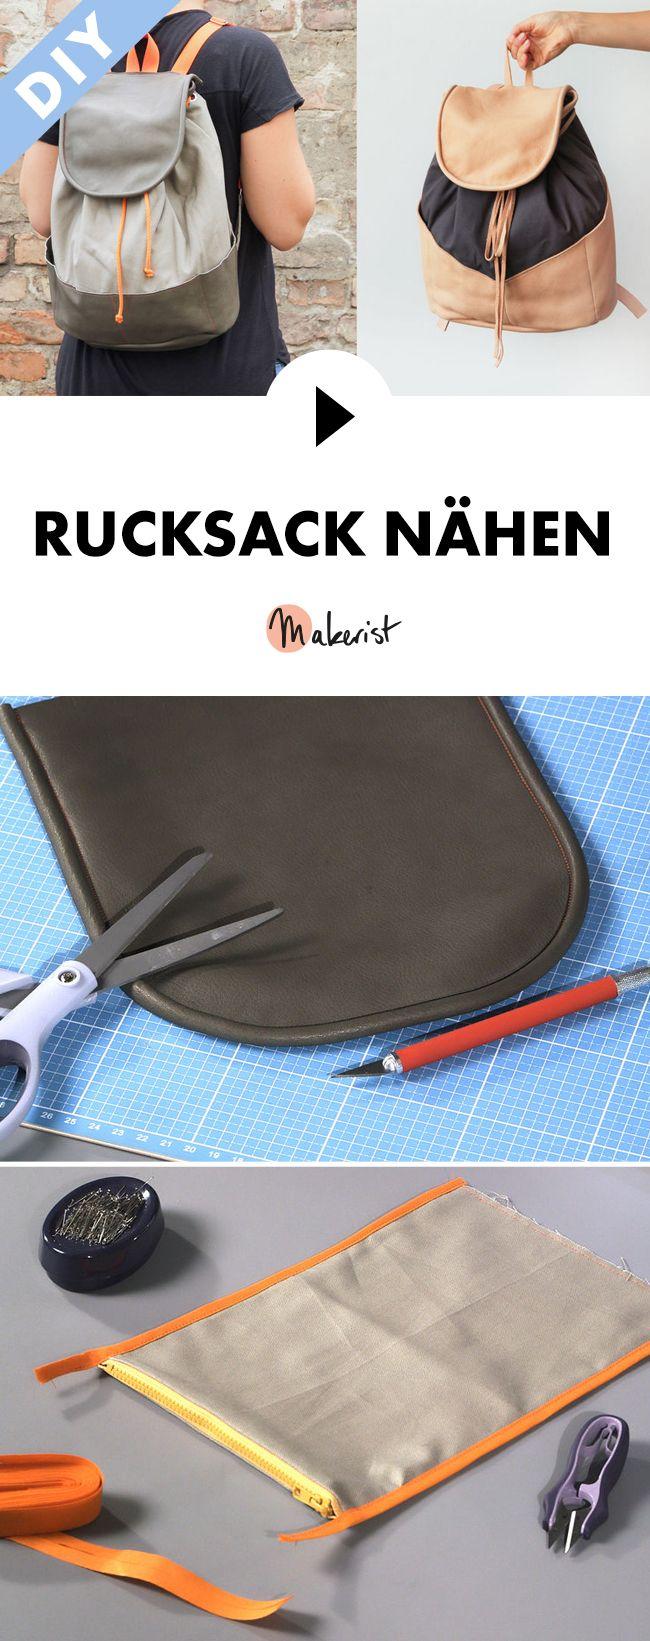 254 best Nähen - Accessoires & Taschen images on Pinterest | Diy ...